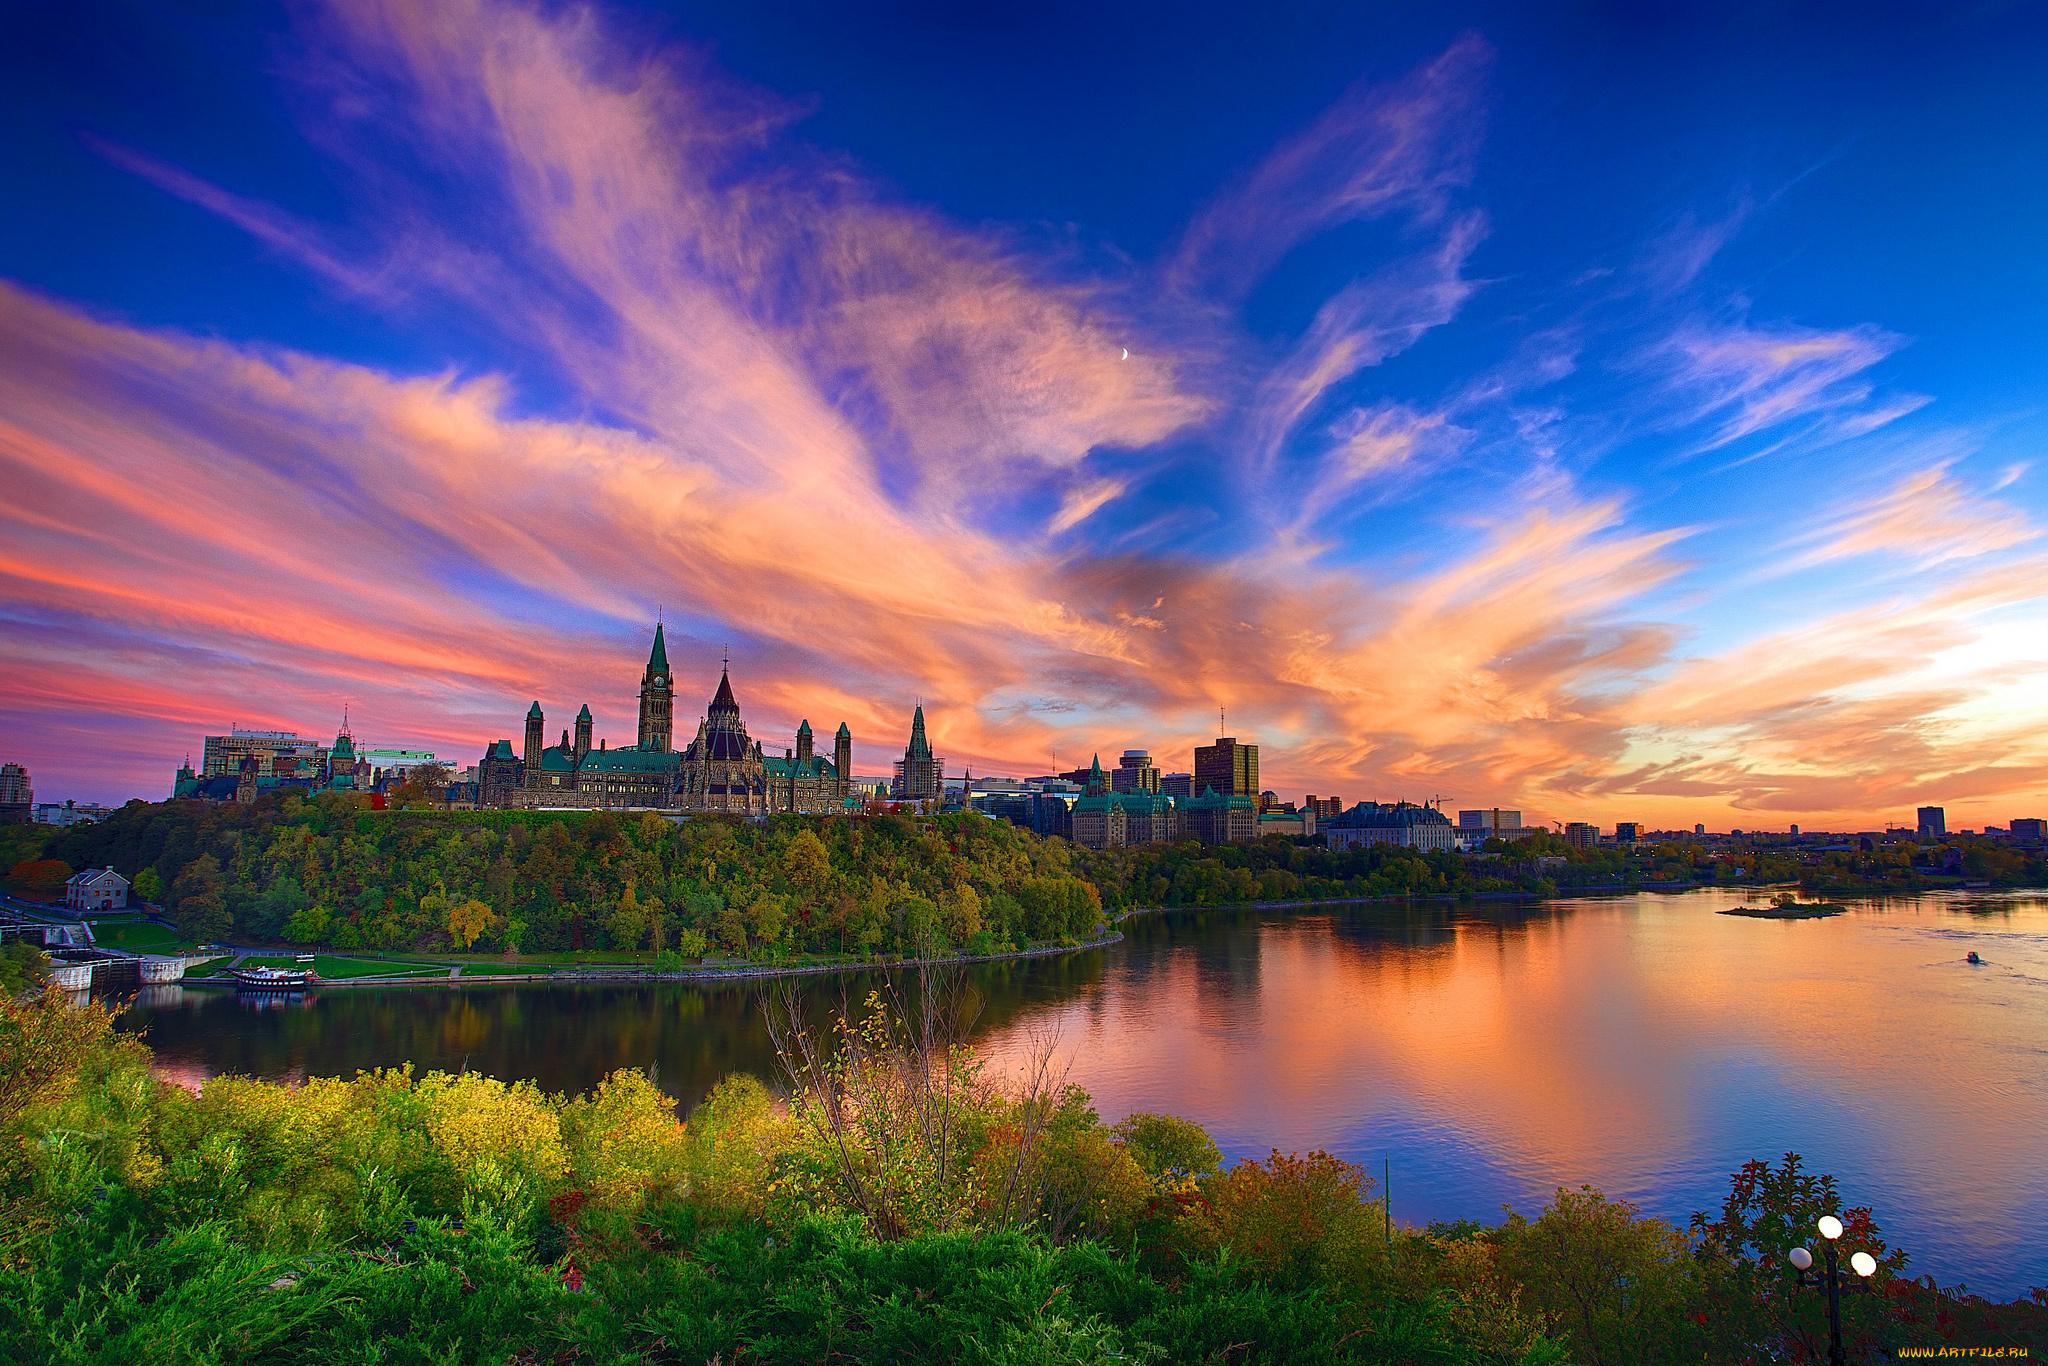 Parliament Building, Ontario, Canada  № 932283 бесплатно